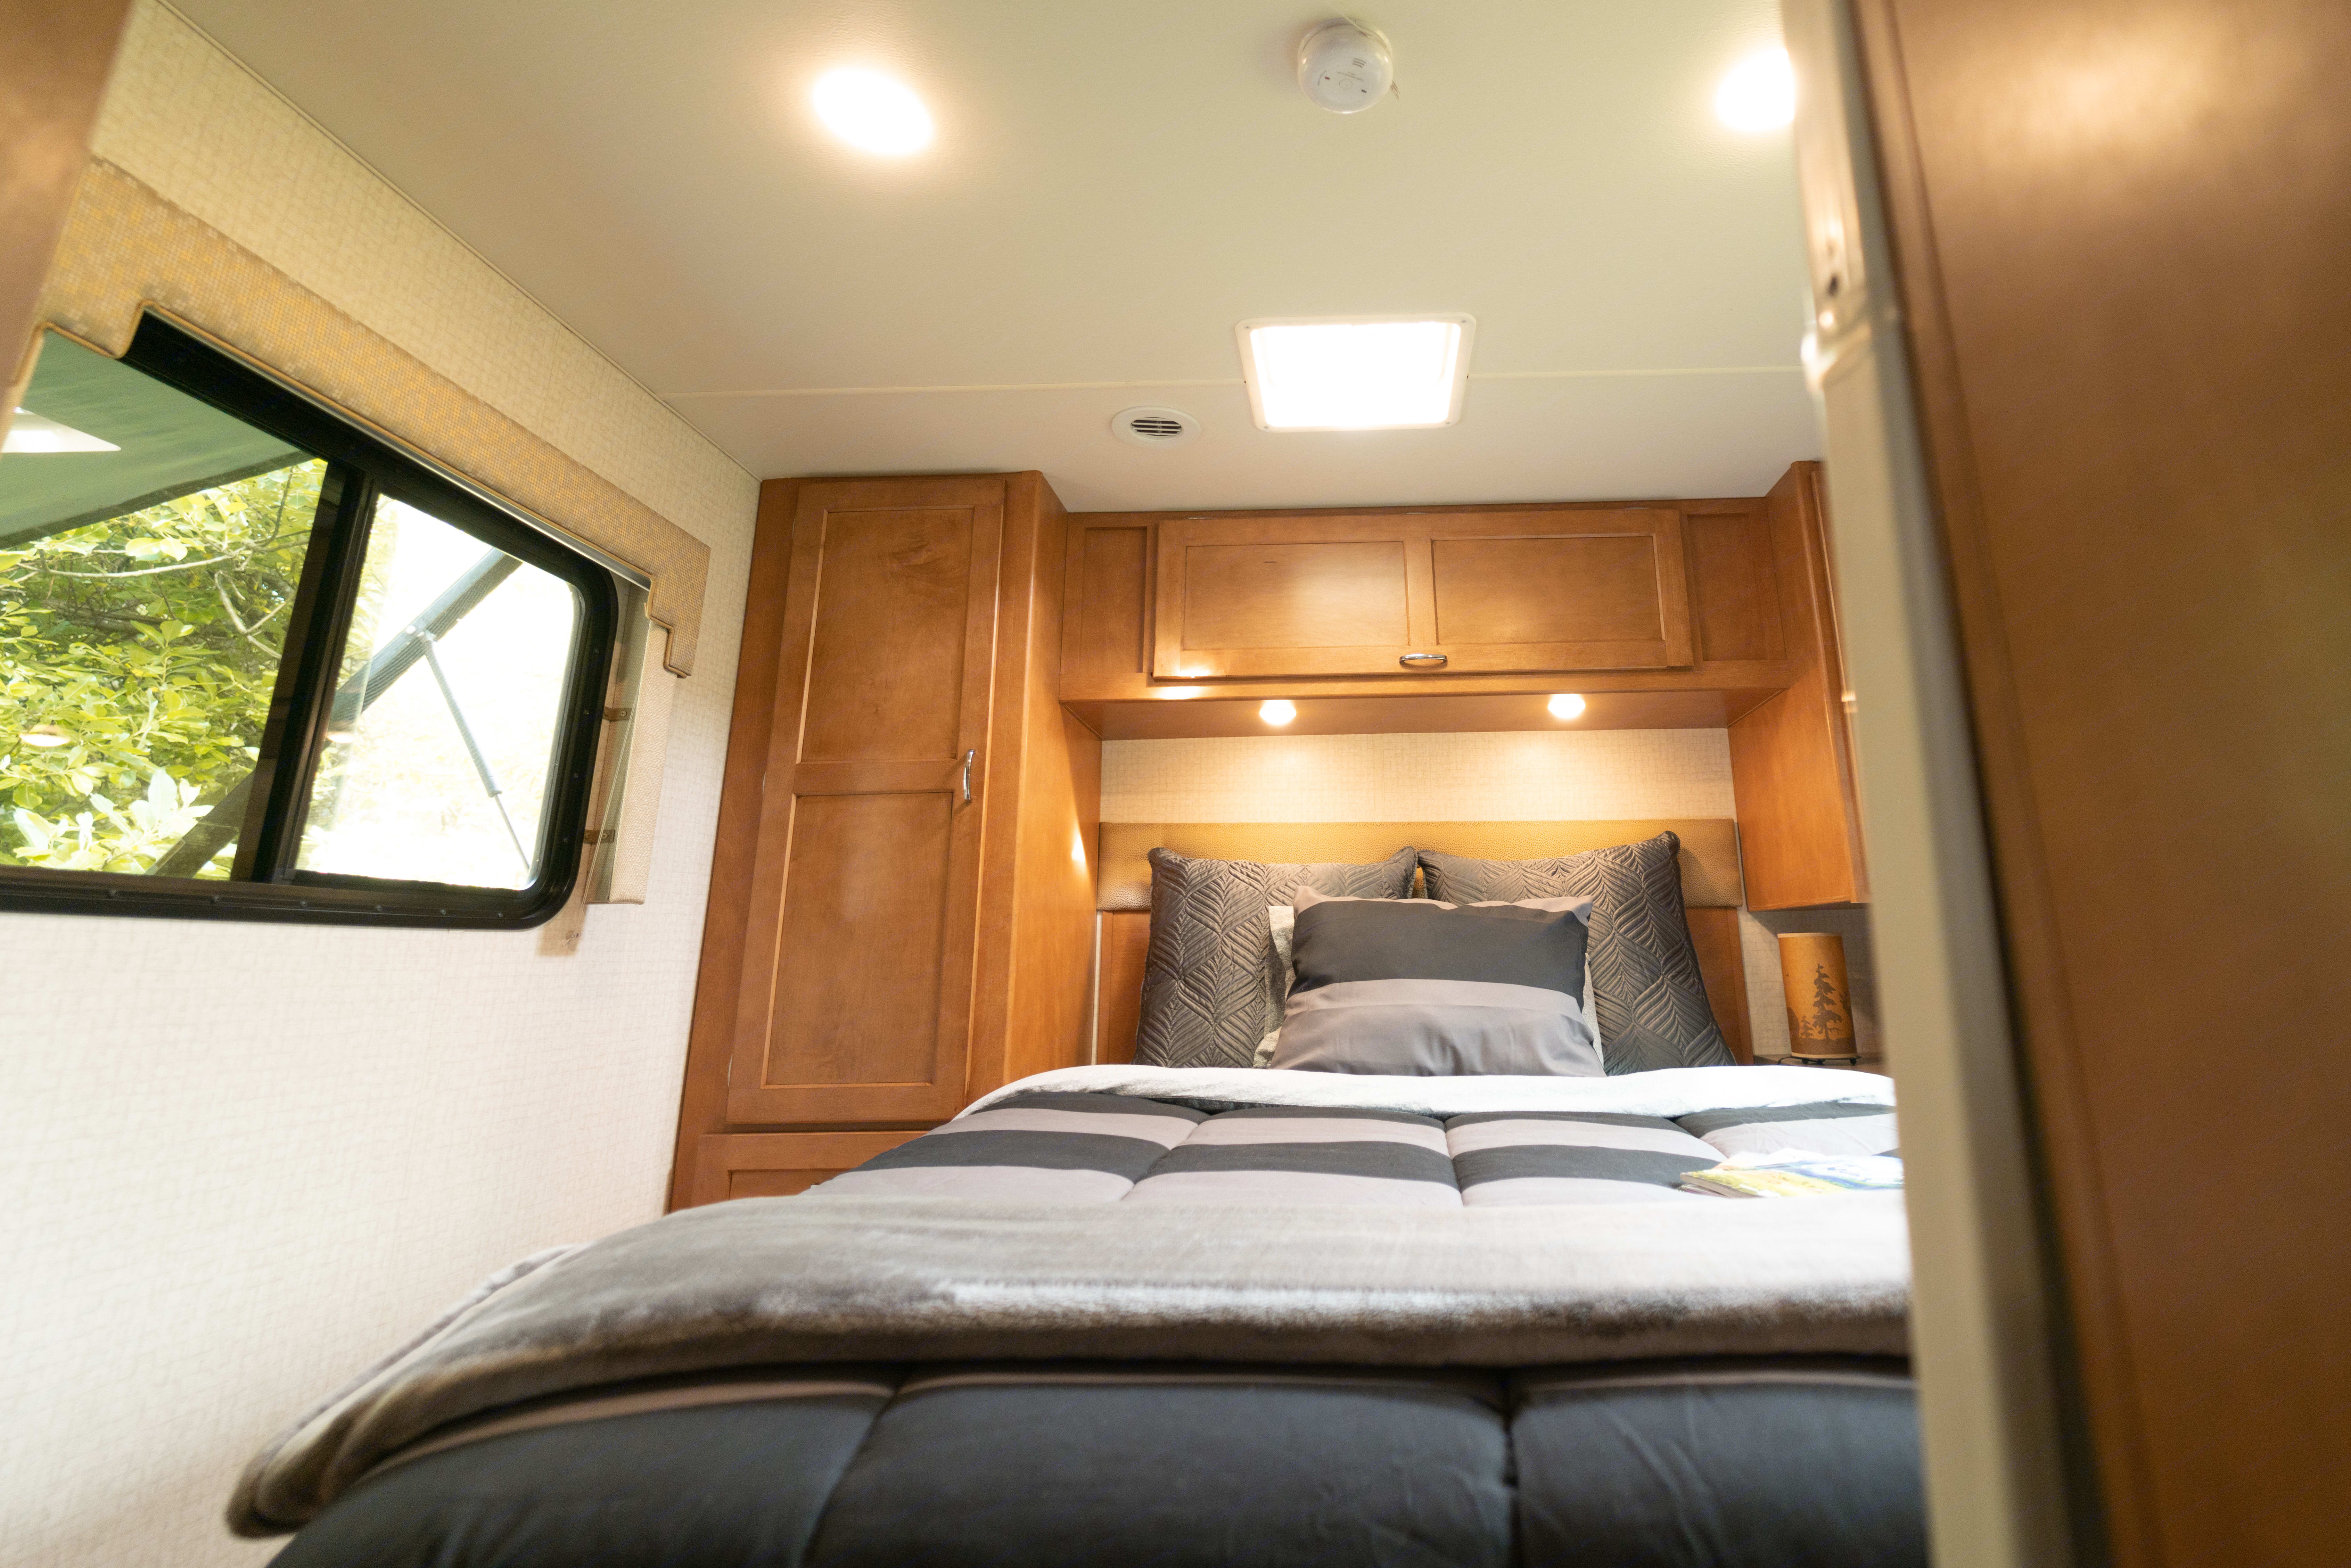 Roomie Master Bedroom. Winnebago Minnie 2017